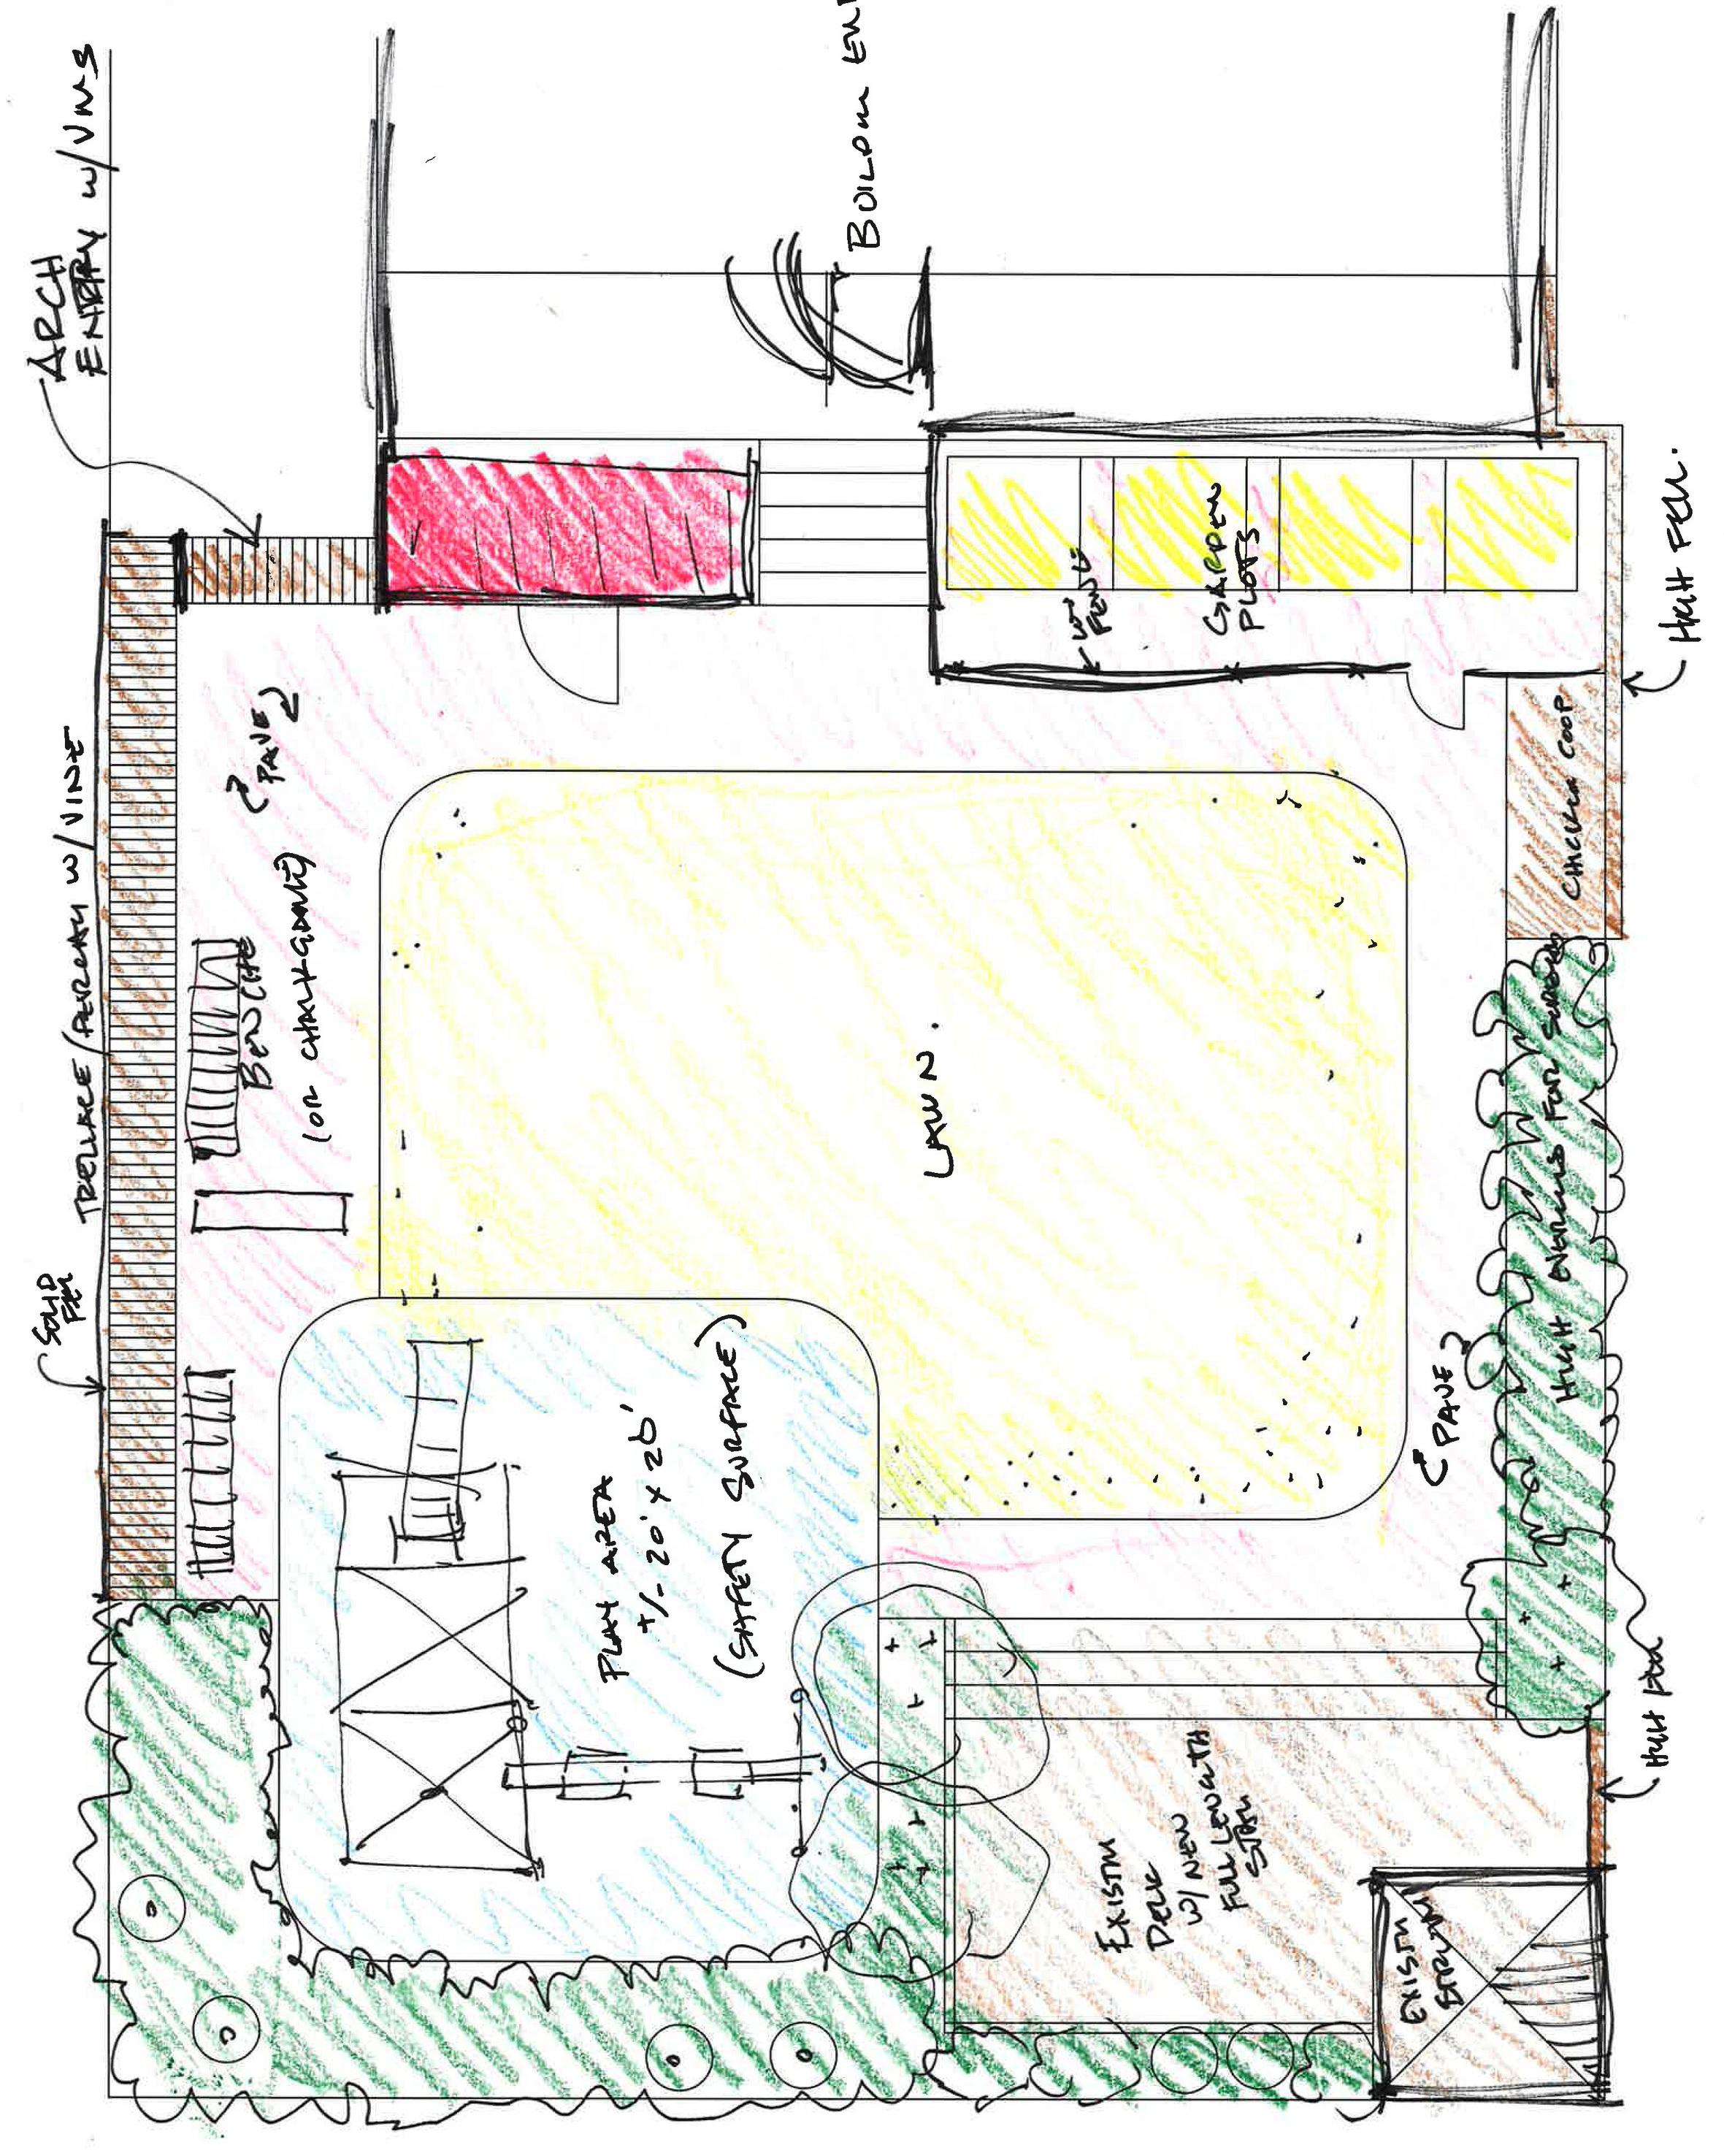 Concept Development Sketch